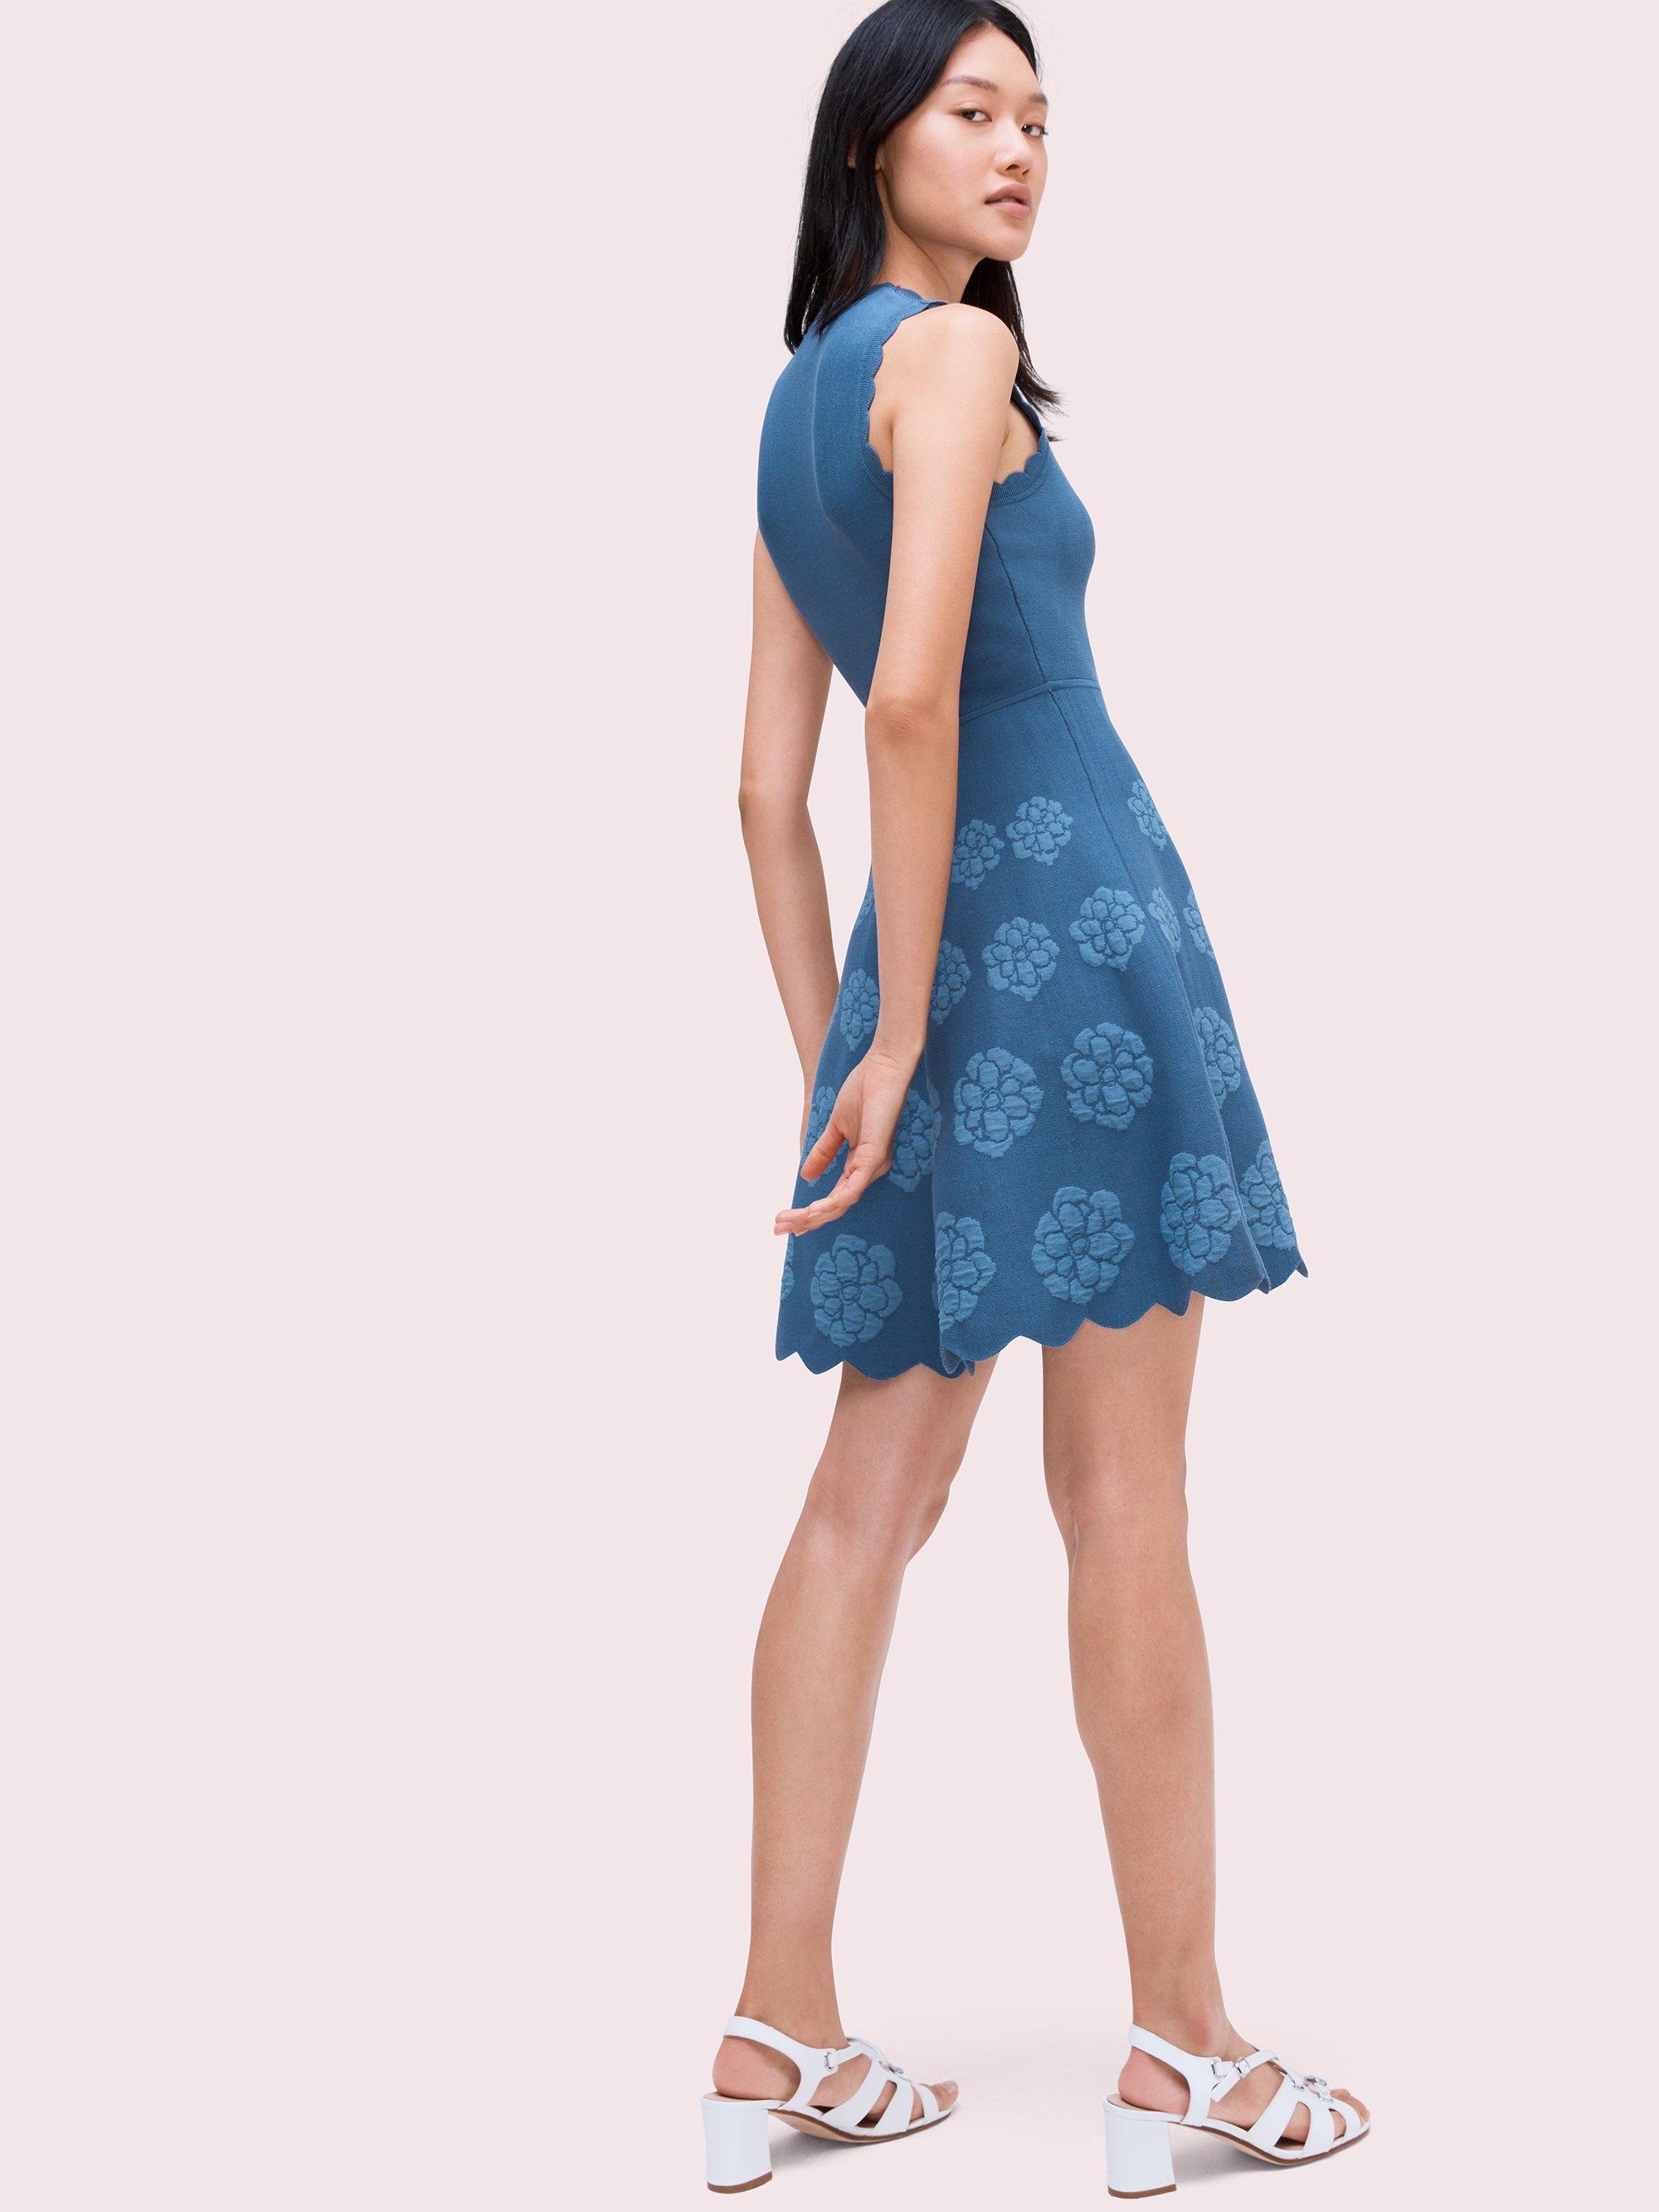 ad3aaee2388 Kate Spade - Blue Flora Hem Sweater Dress - Lyst. View fullscreen